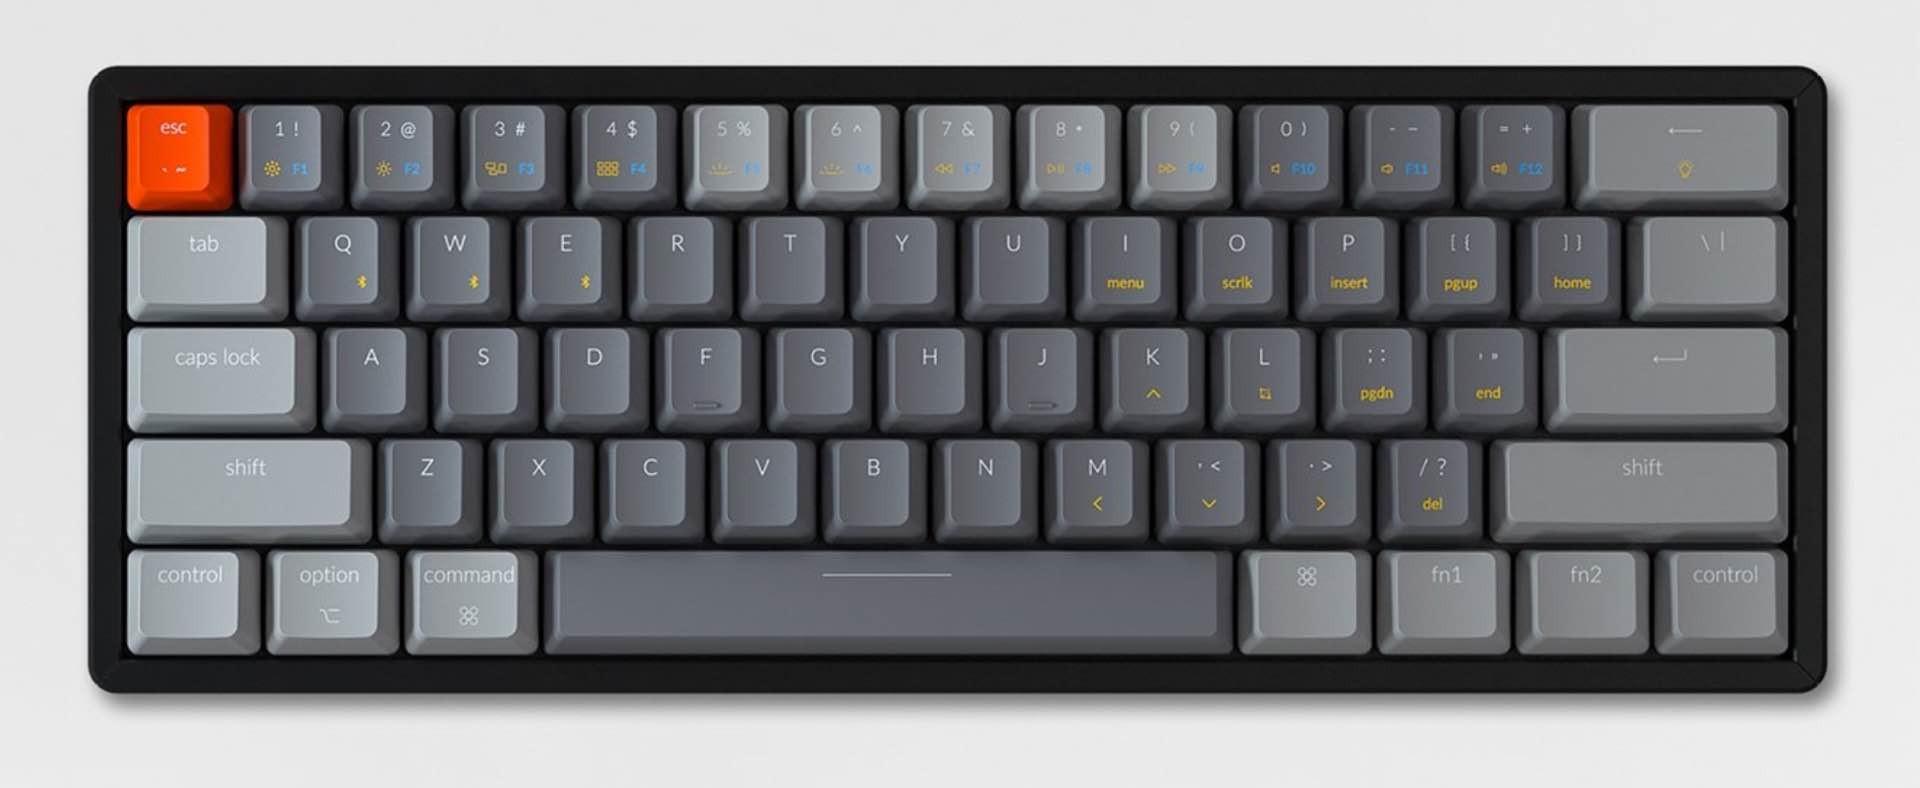 keychron-k12-60-layout-wireless-mechanical-keyboard-detail